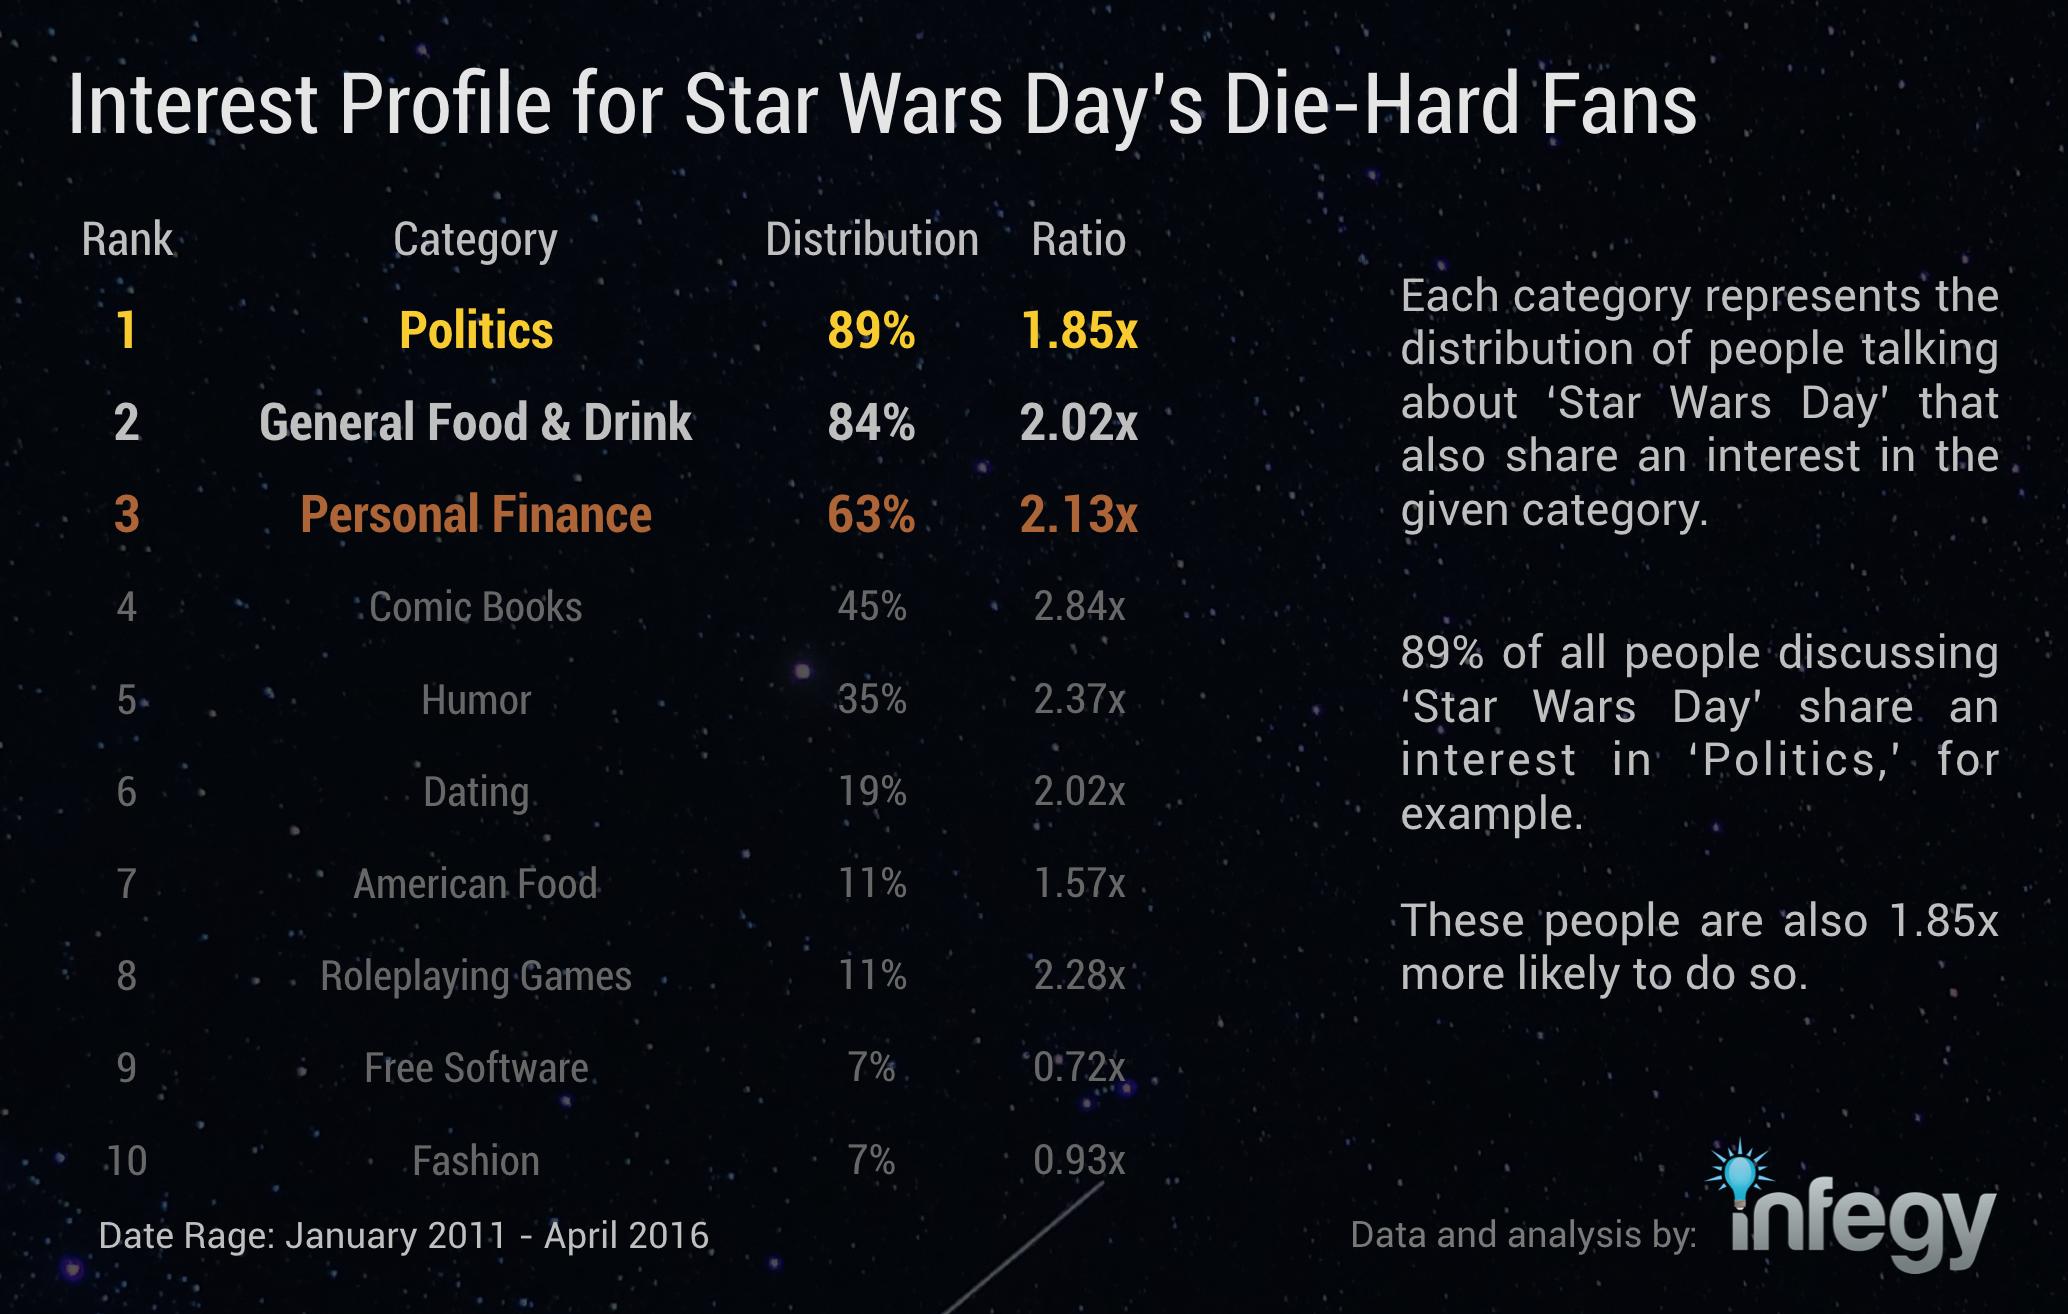 interest-profile-for-star-wars-day-die-hard-fans.png